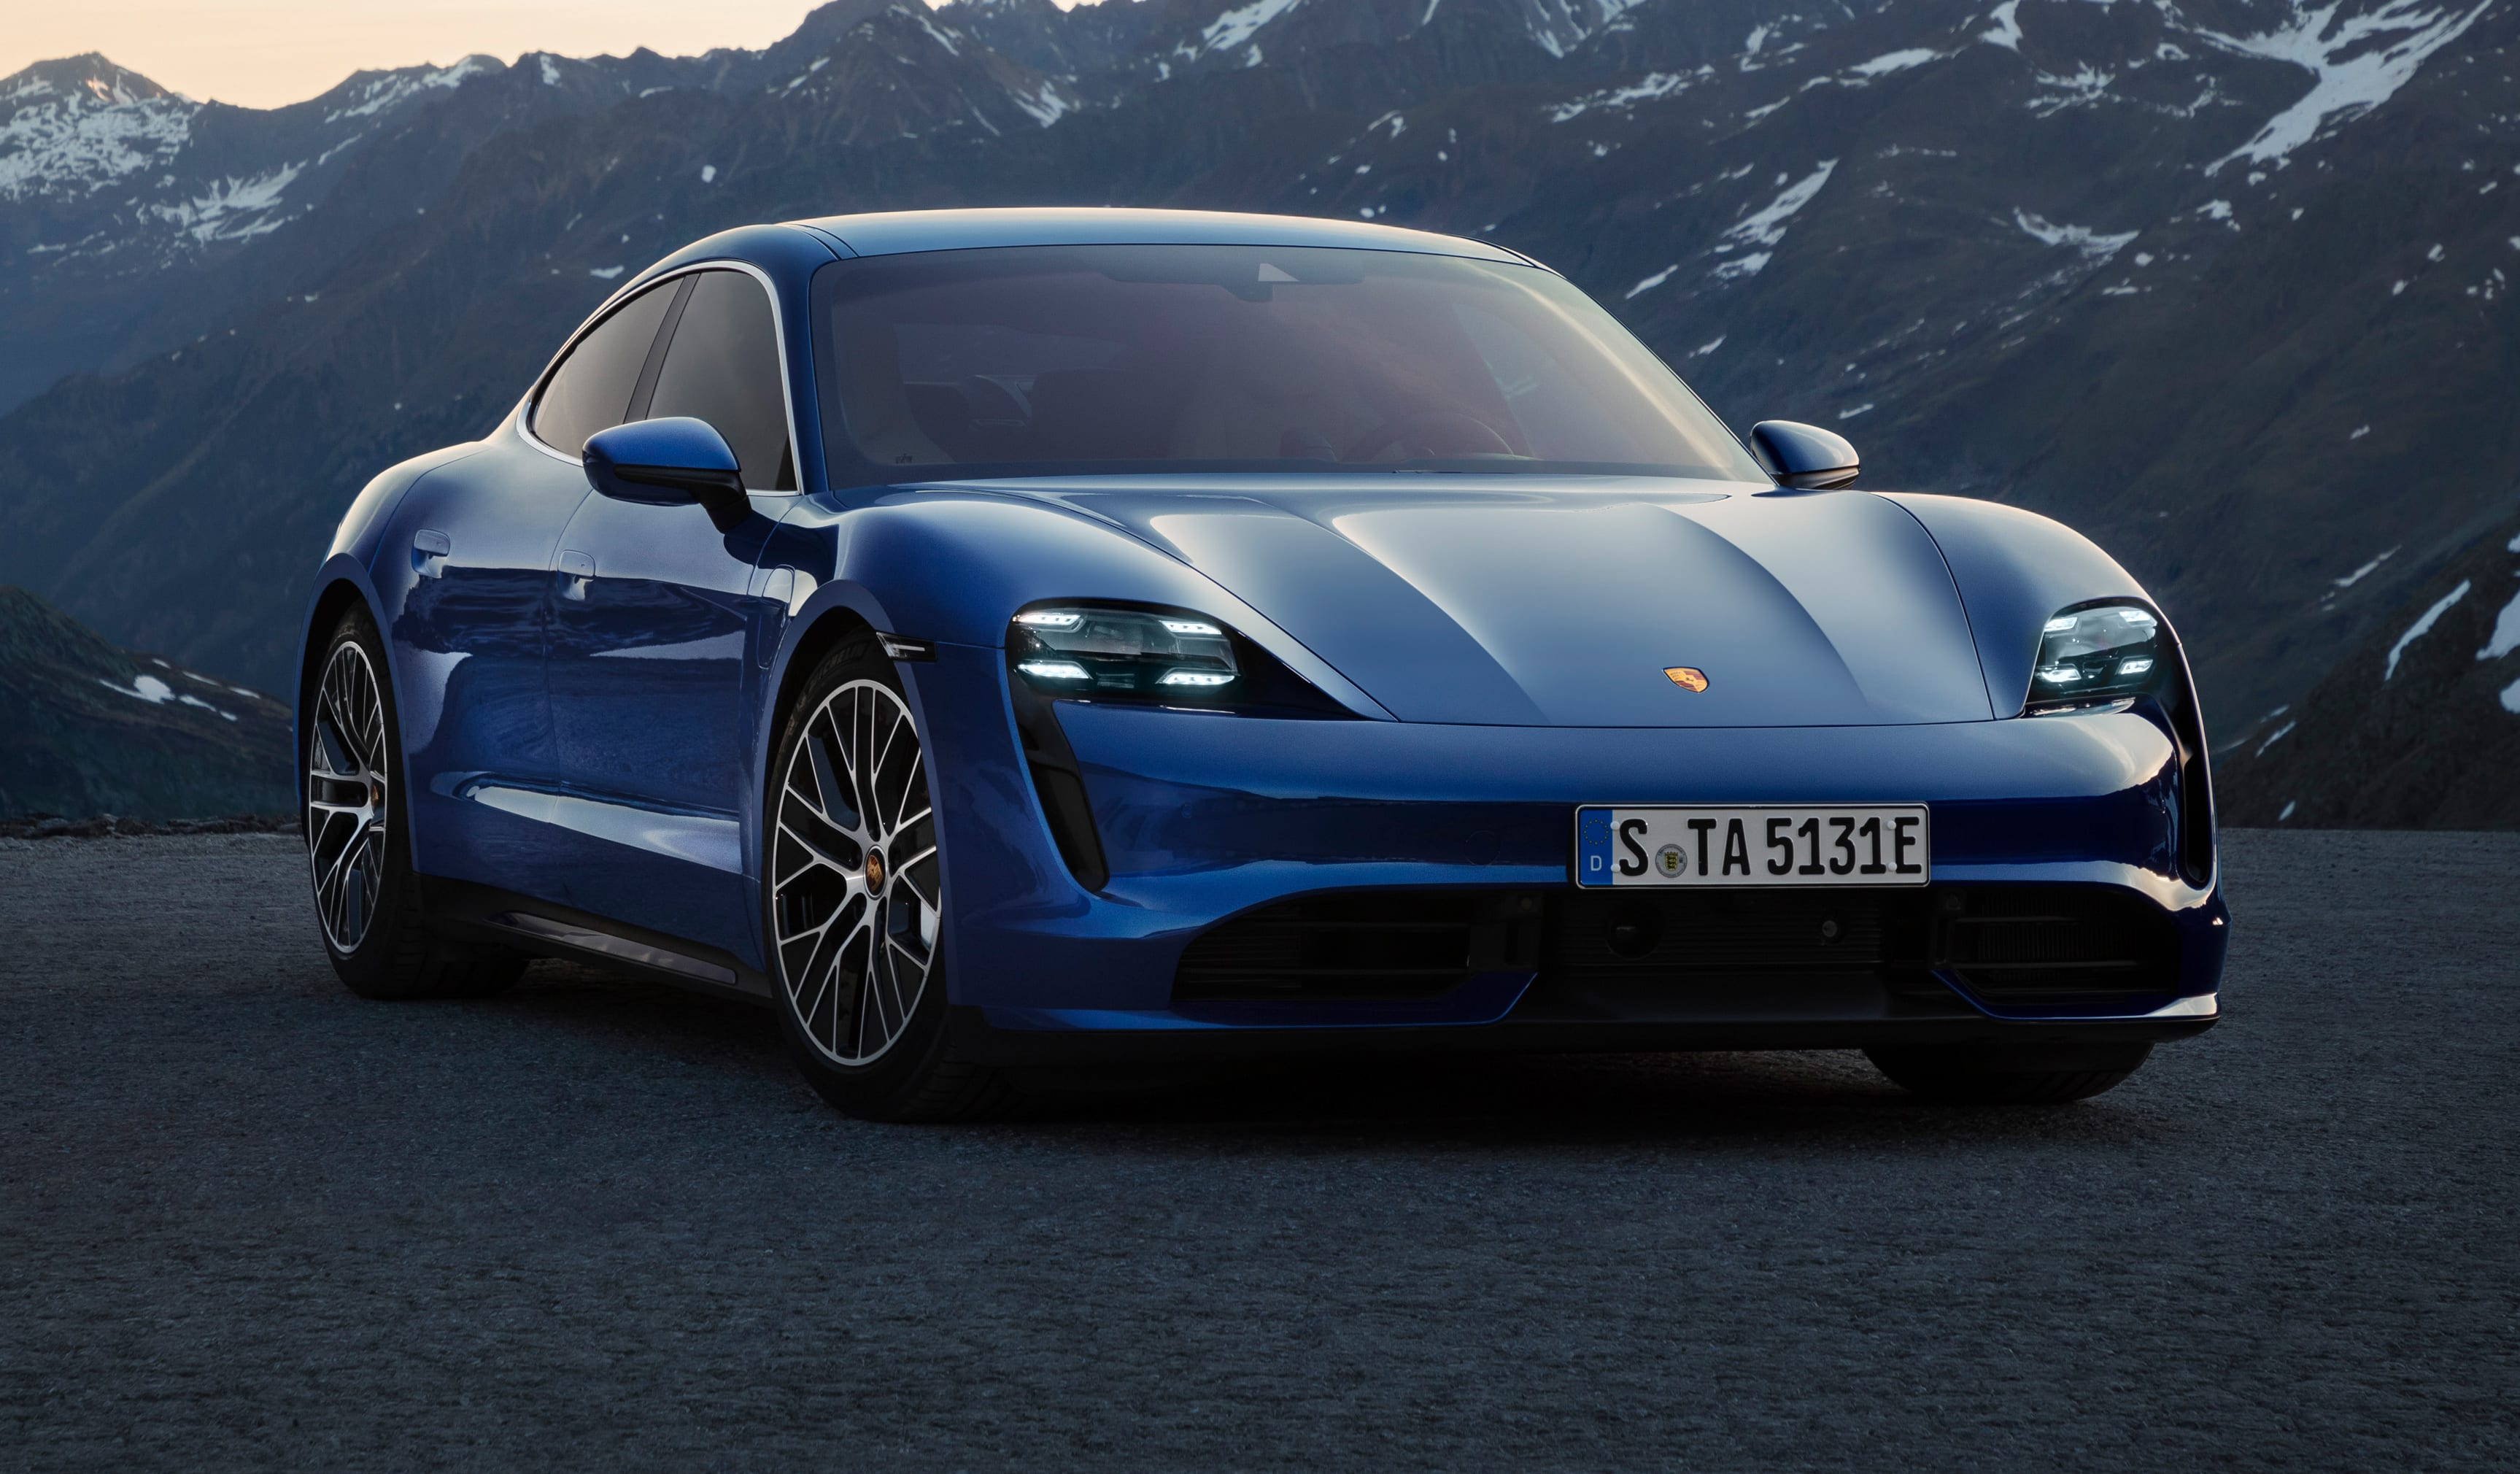 Epa Reports Lower Range For Porsche Taycan Turbo Caradvice